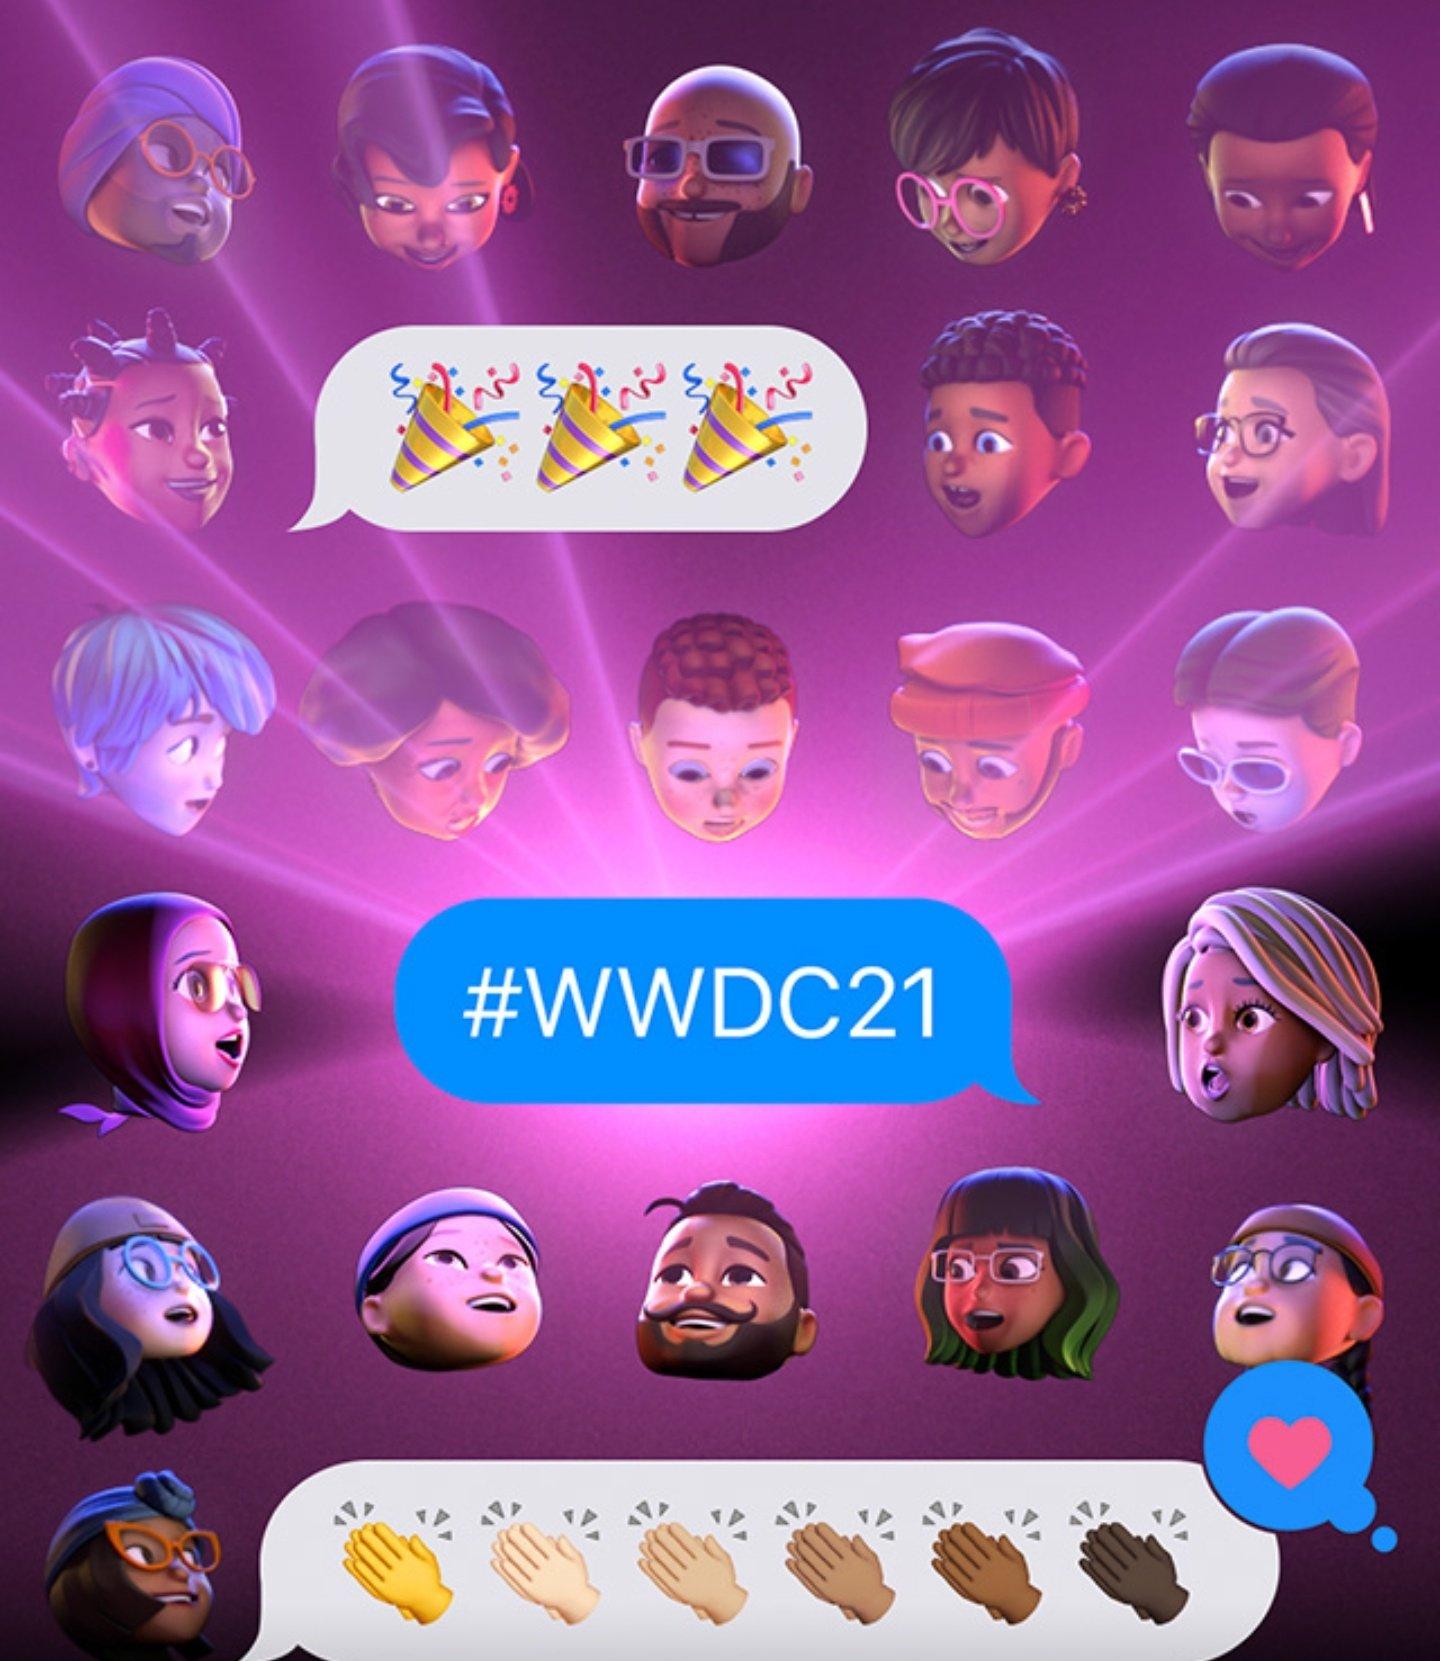 Re-watch the WWDC 2021 by Apple